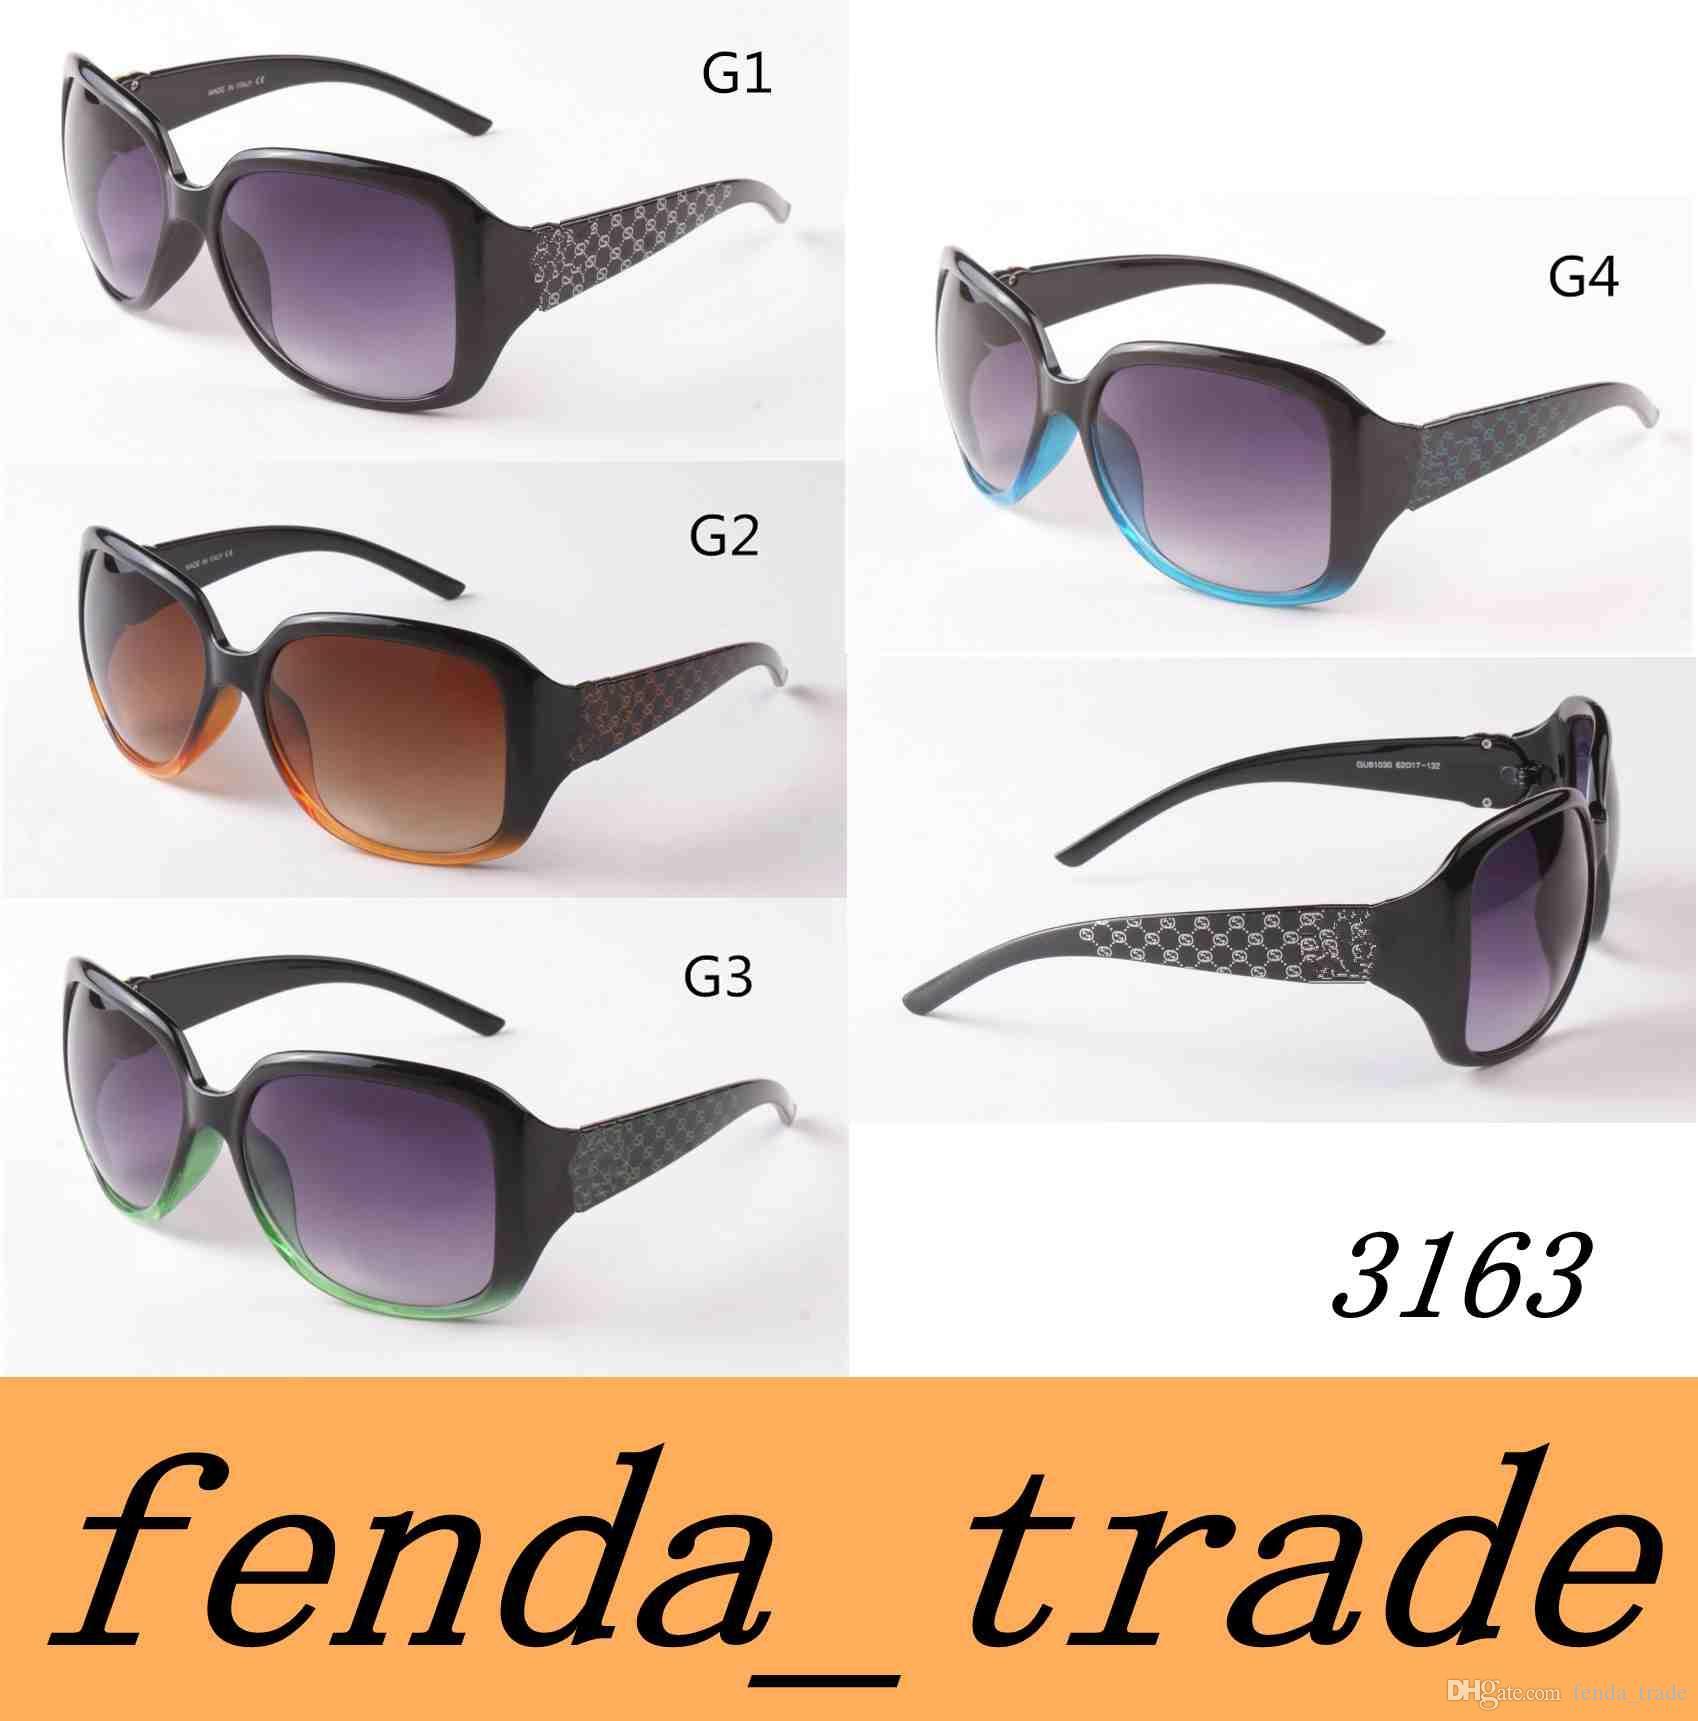 84d37aa91935a 2018 New Fashion Sunglasses 3163 Sunglasses Fashion Big Frame Sunglasses  Ladies Trend Glasses UV400 High Quality MOQ 10 Fastrack Sunglasses Smith  Sunglasses ...